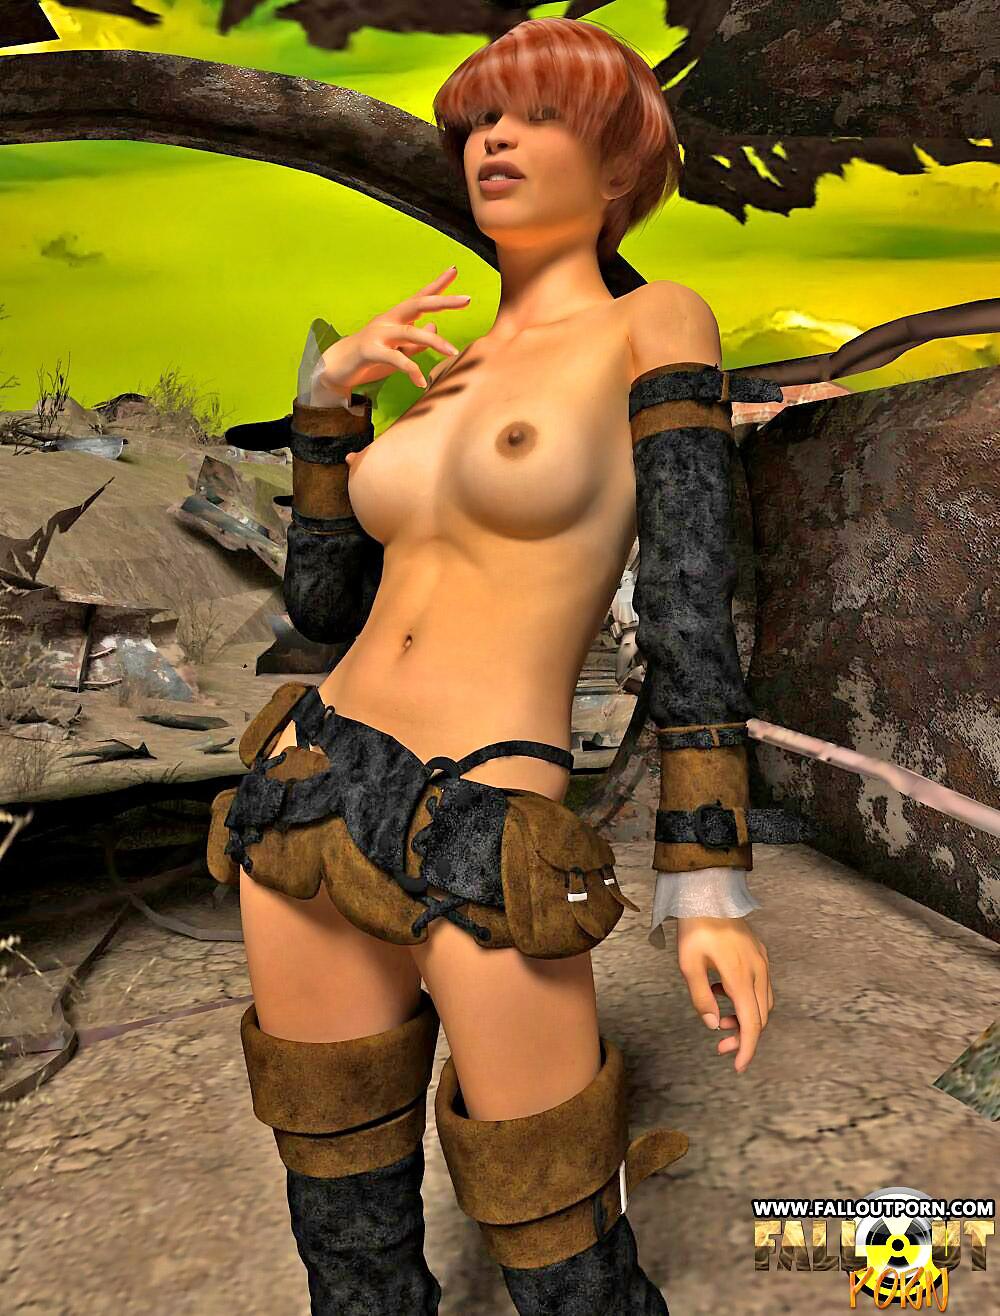 Tomb raider sexy fucking pics pron scene